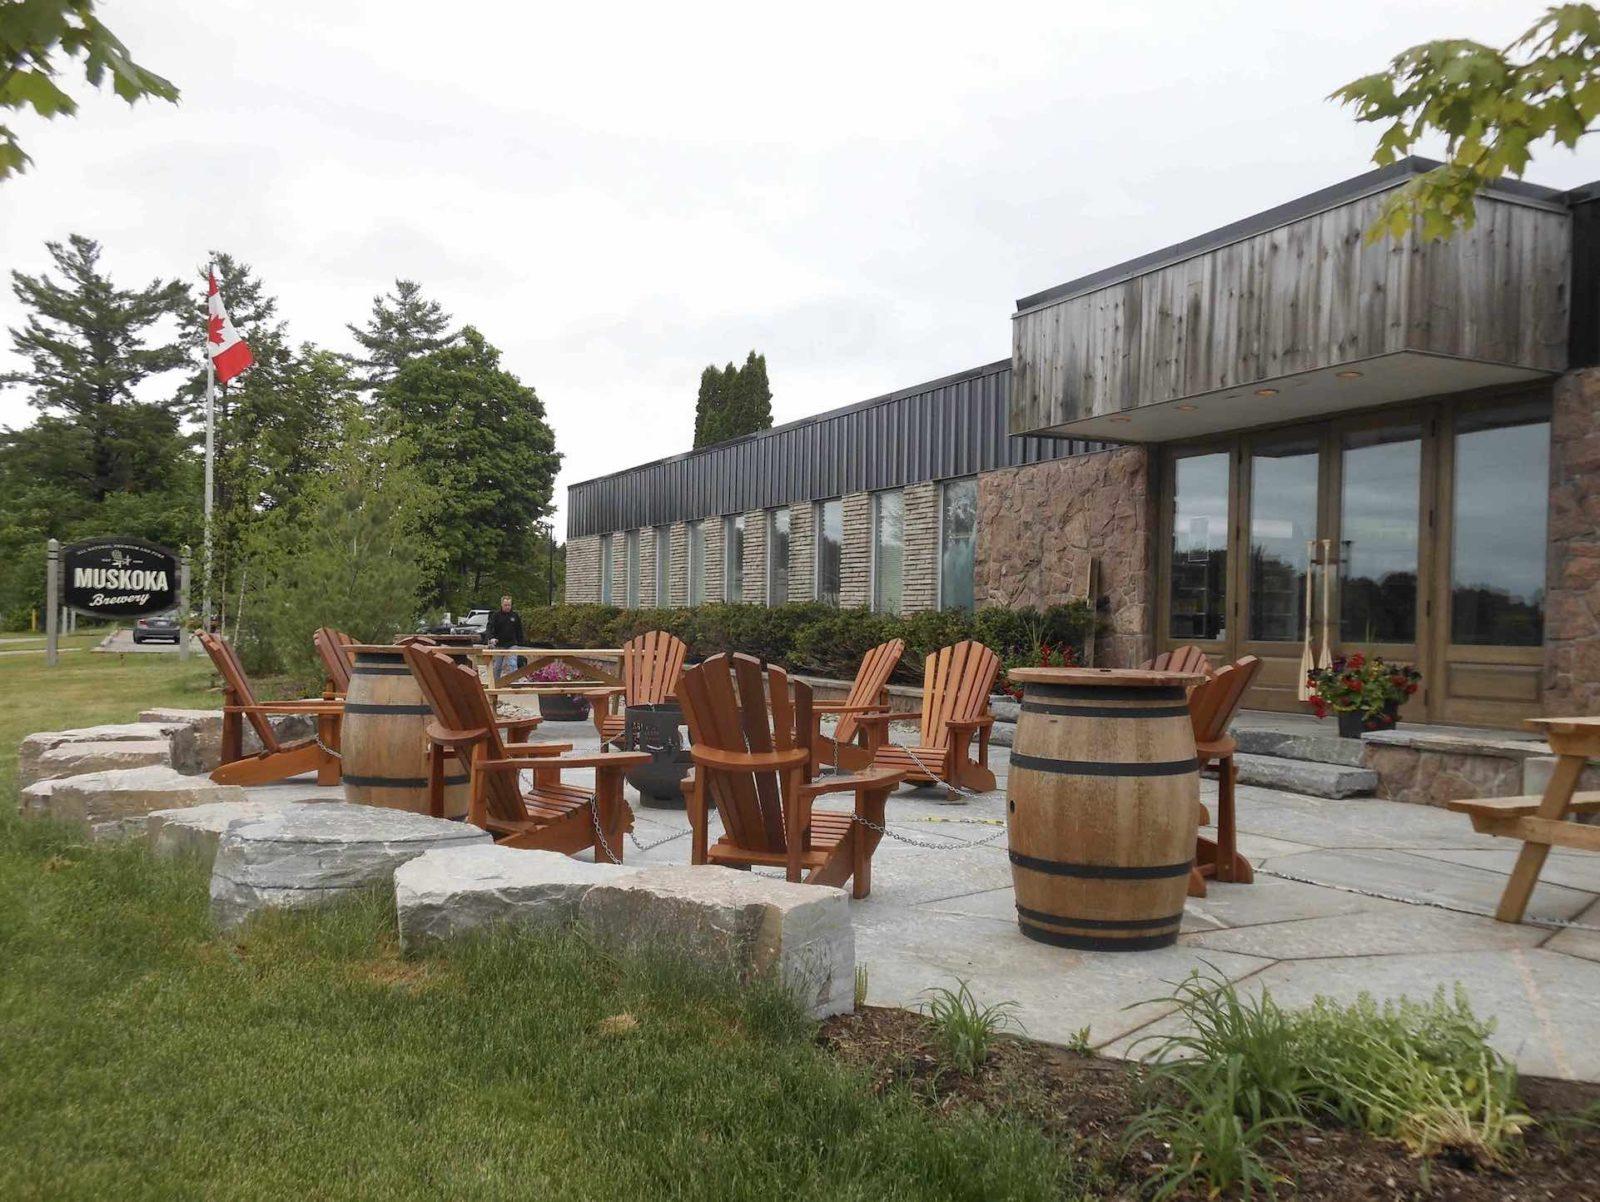 Muskoka Brewery outdoor patio